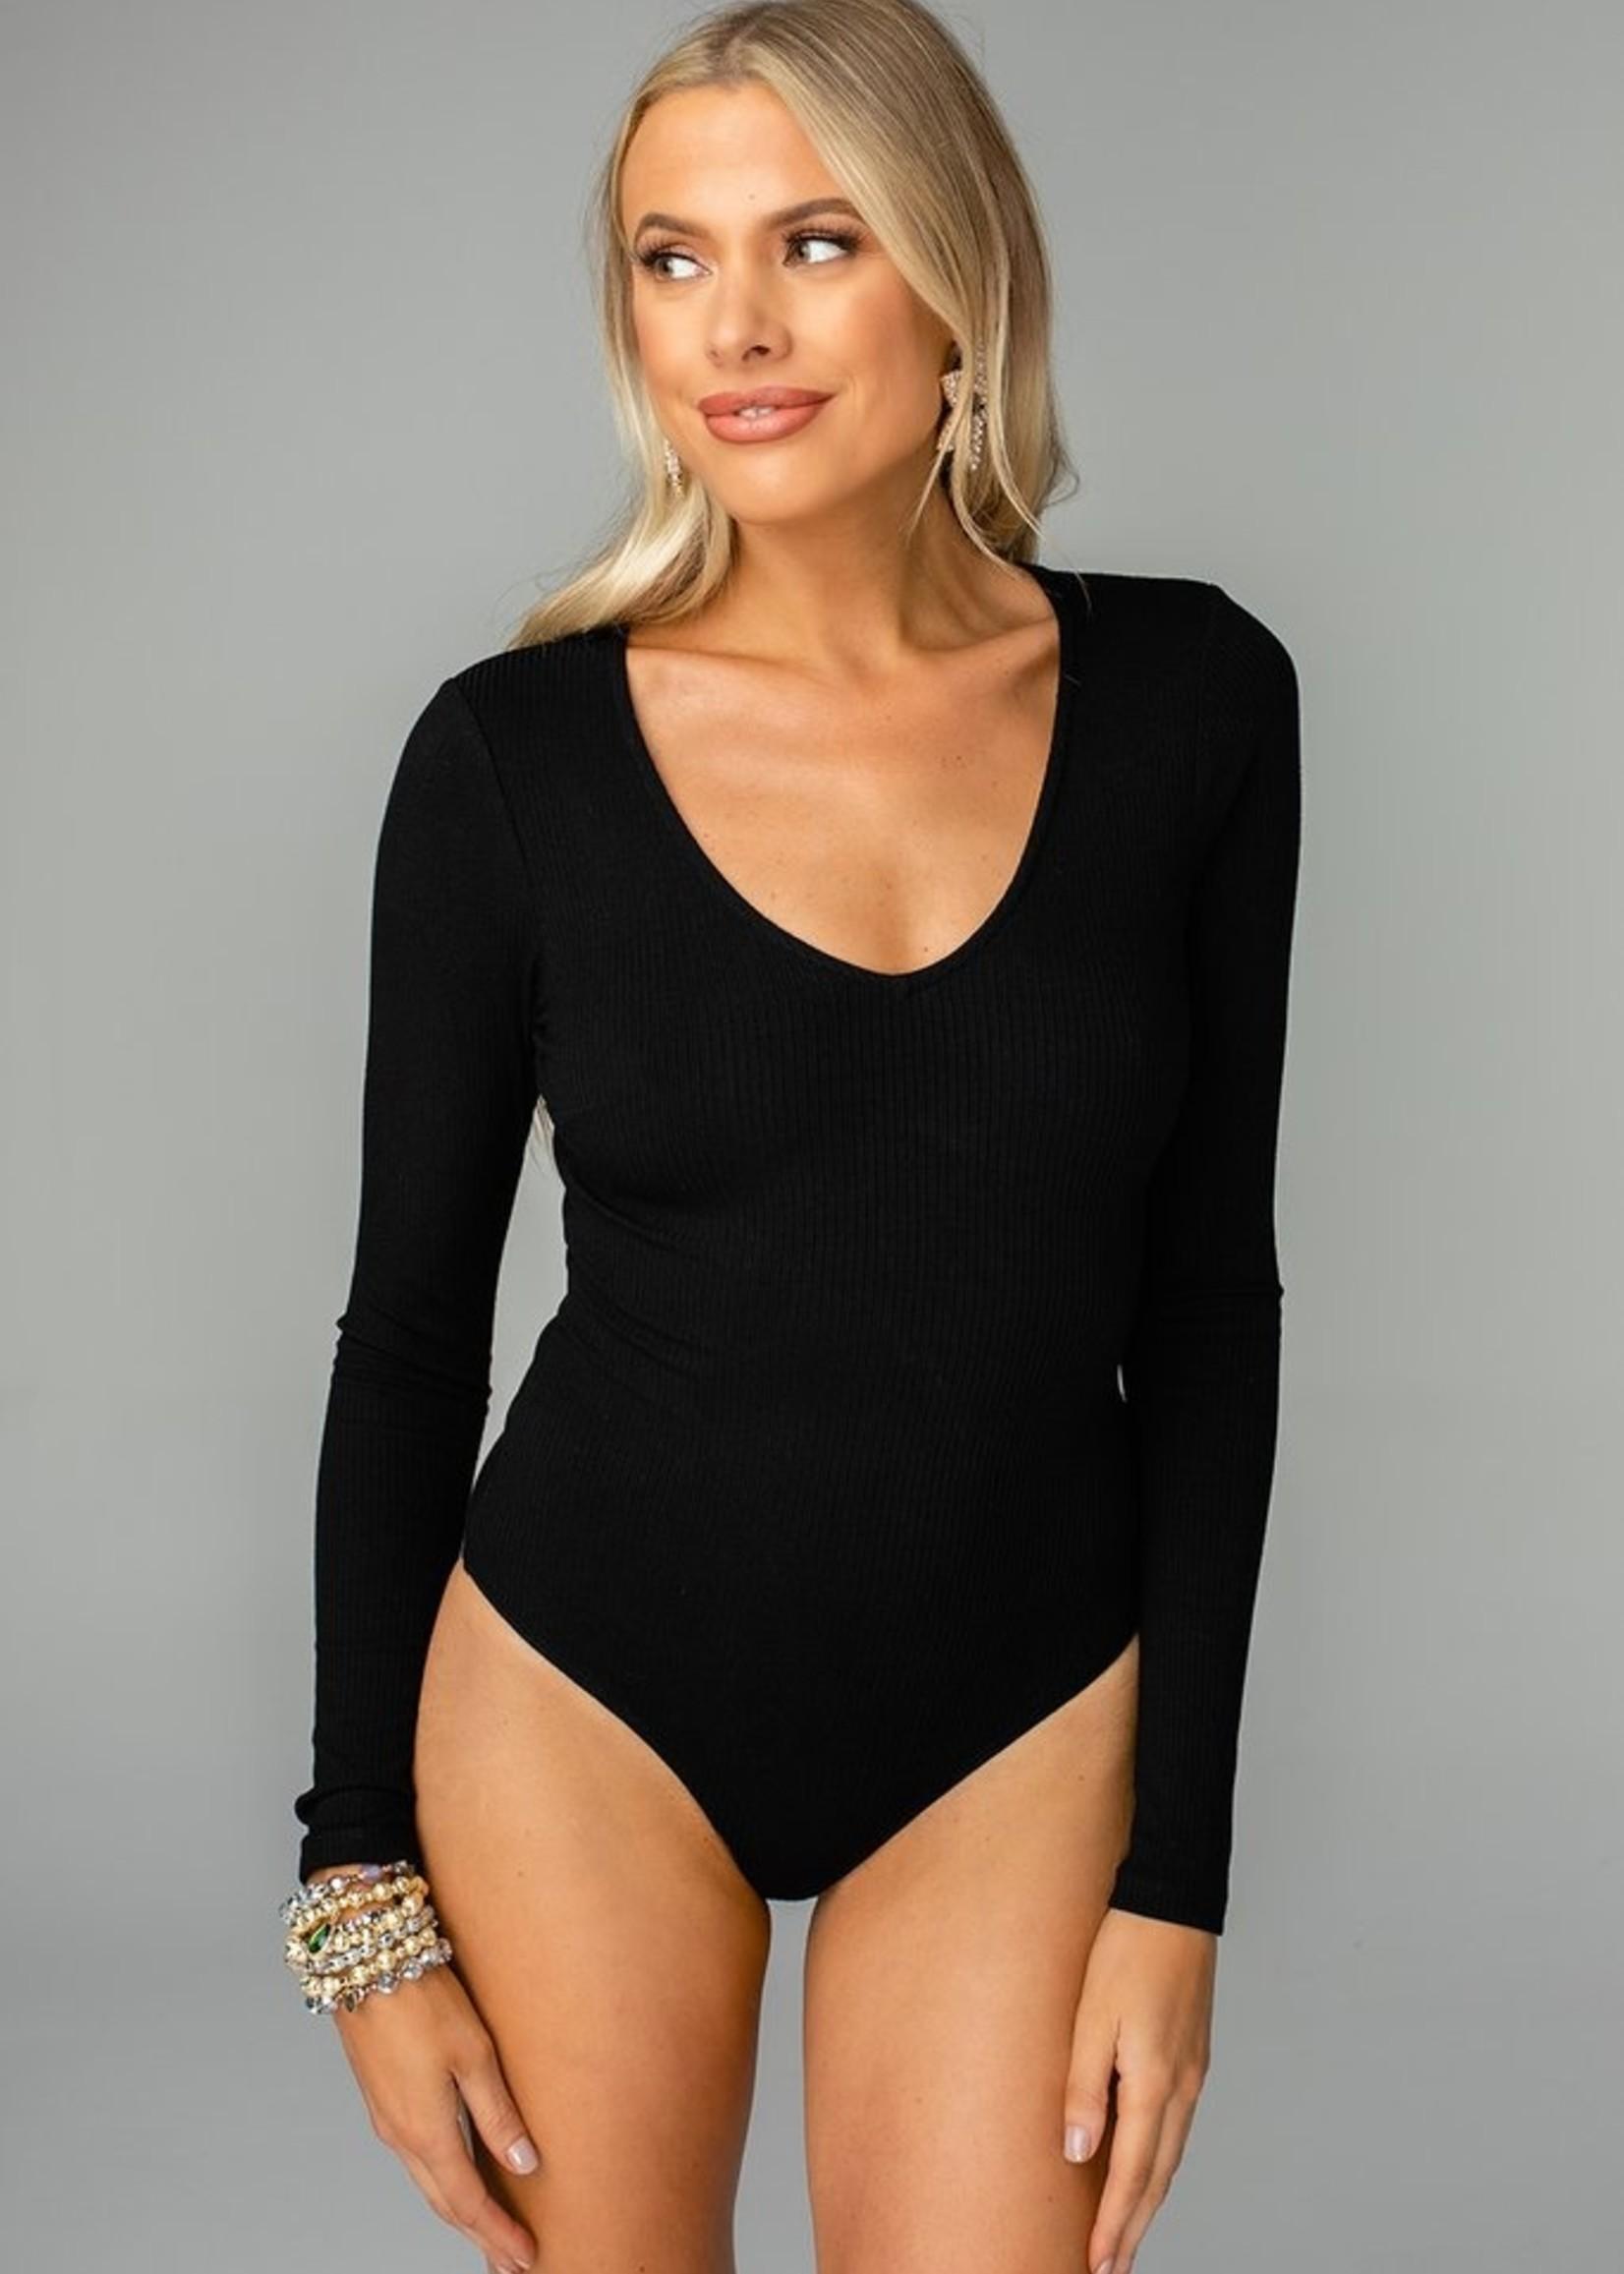 Buddy Love Patti Black Bodysuit